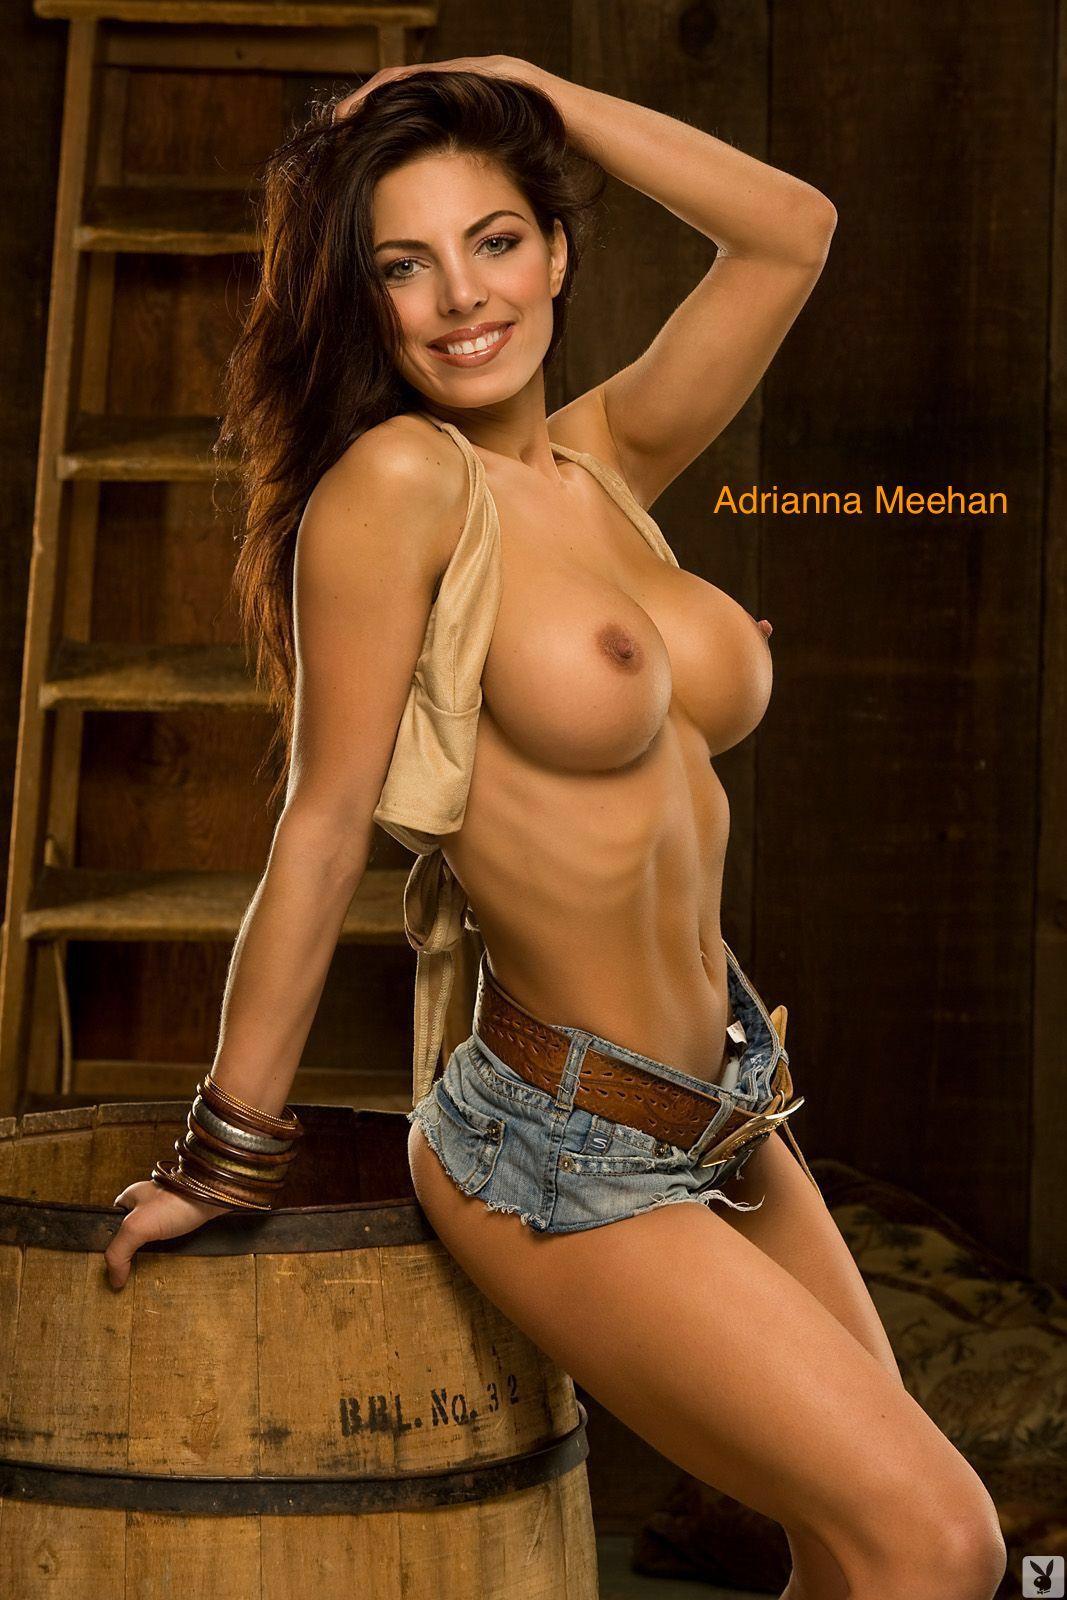 adrianna meehan nackt